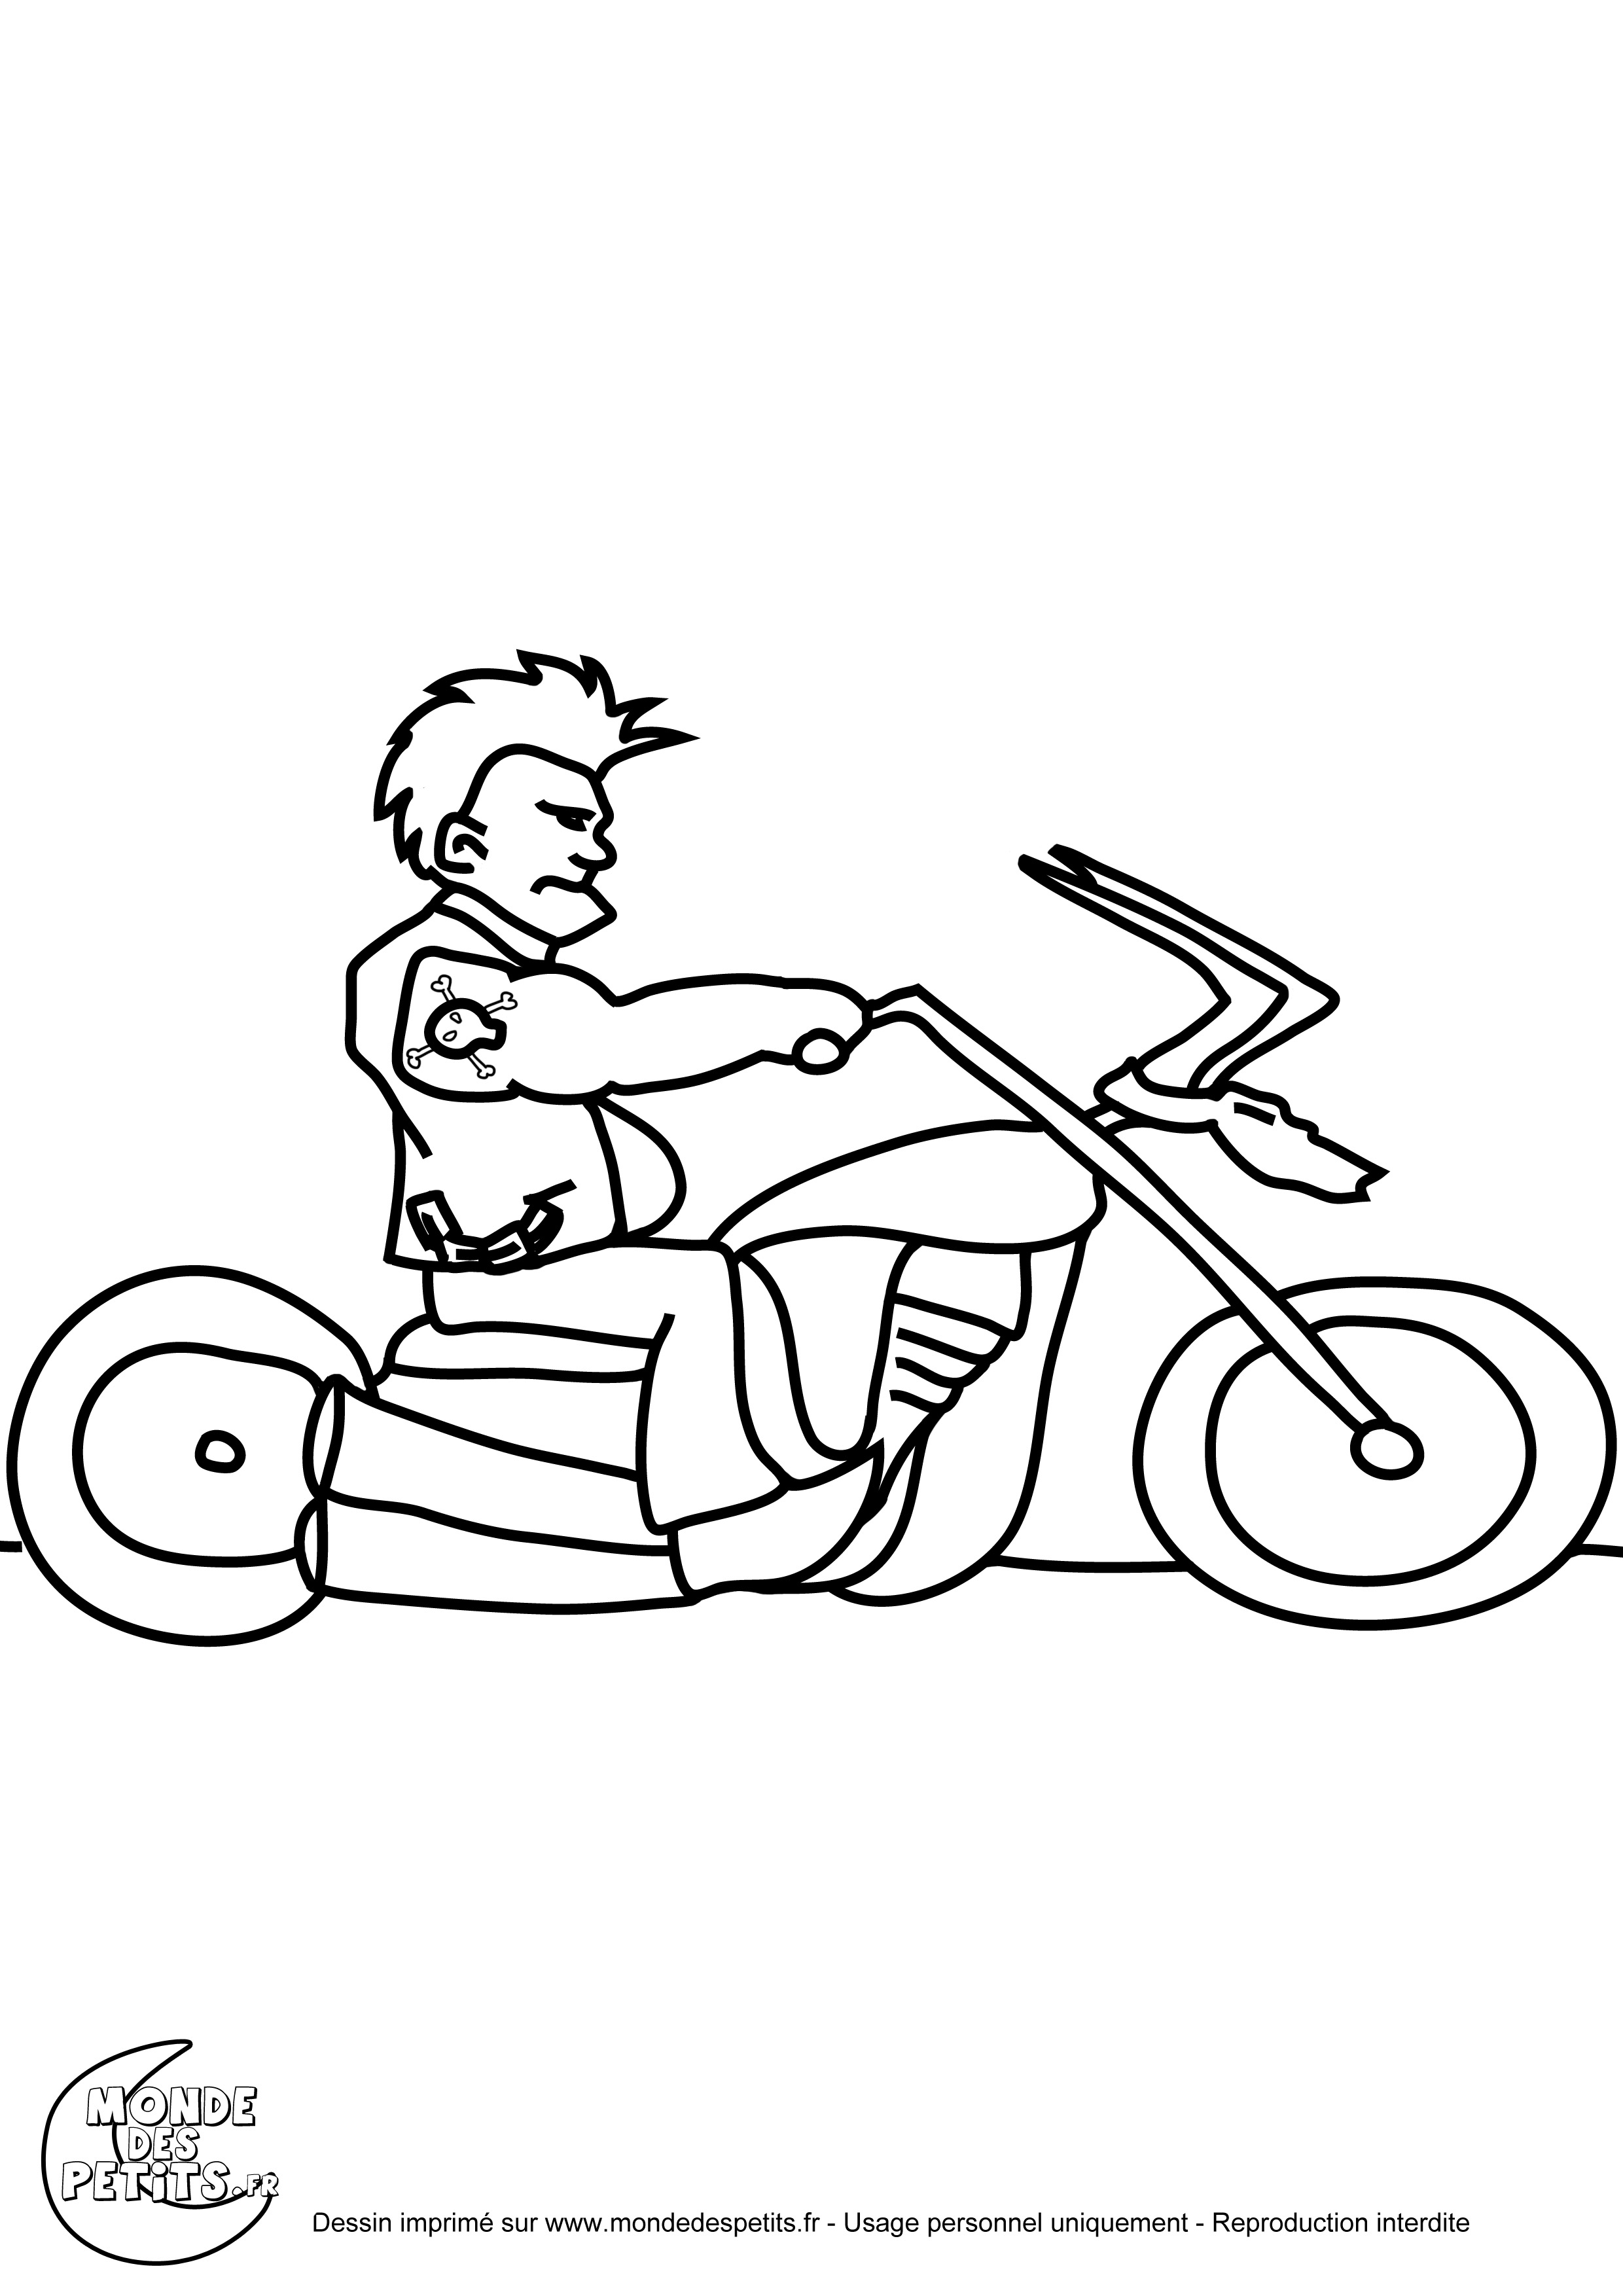 Monde des petits coloriages imprimer - Dessin de motard ...